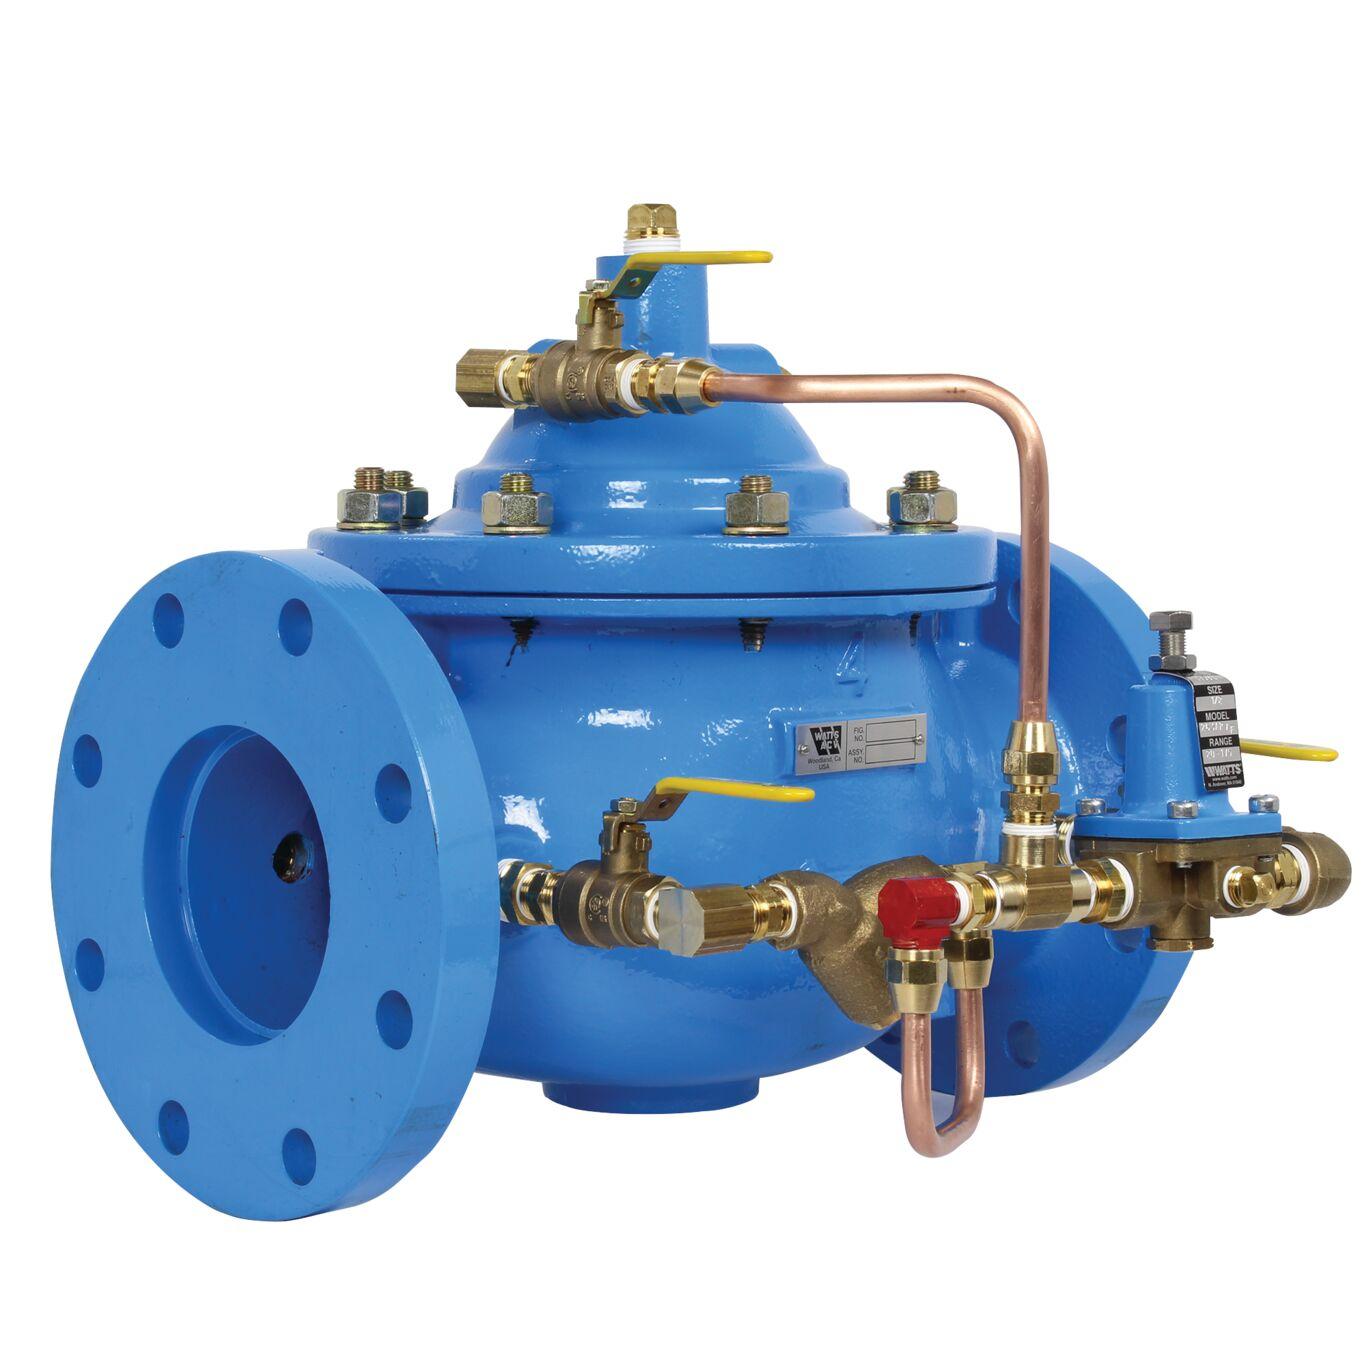 control valve sizing performanc allowable pressure - HD1366×1366